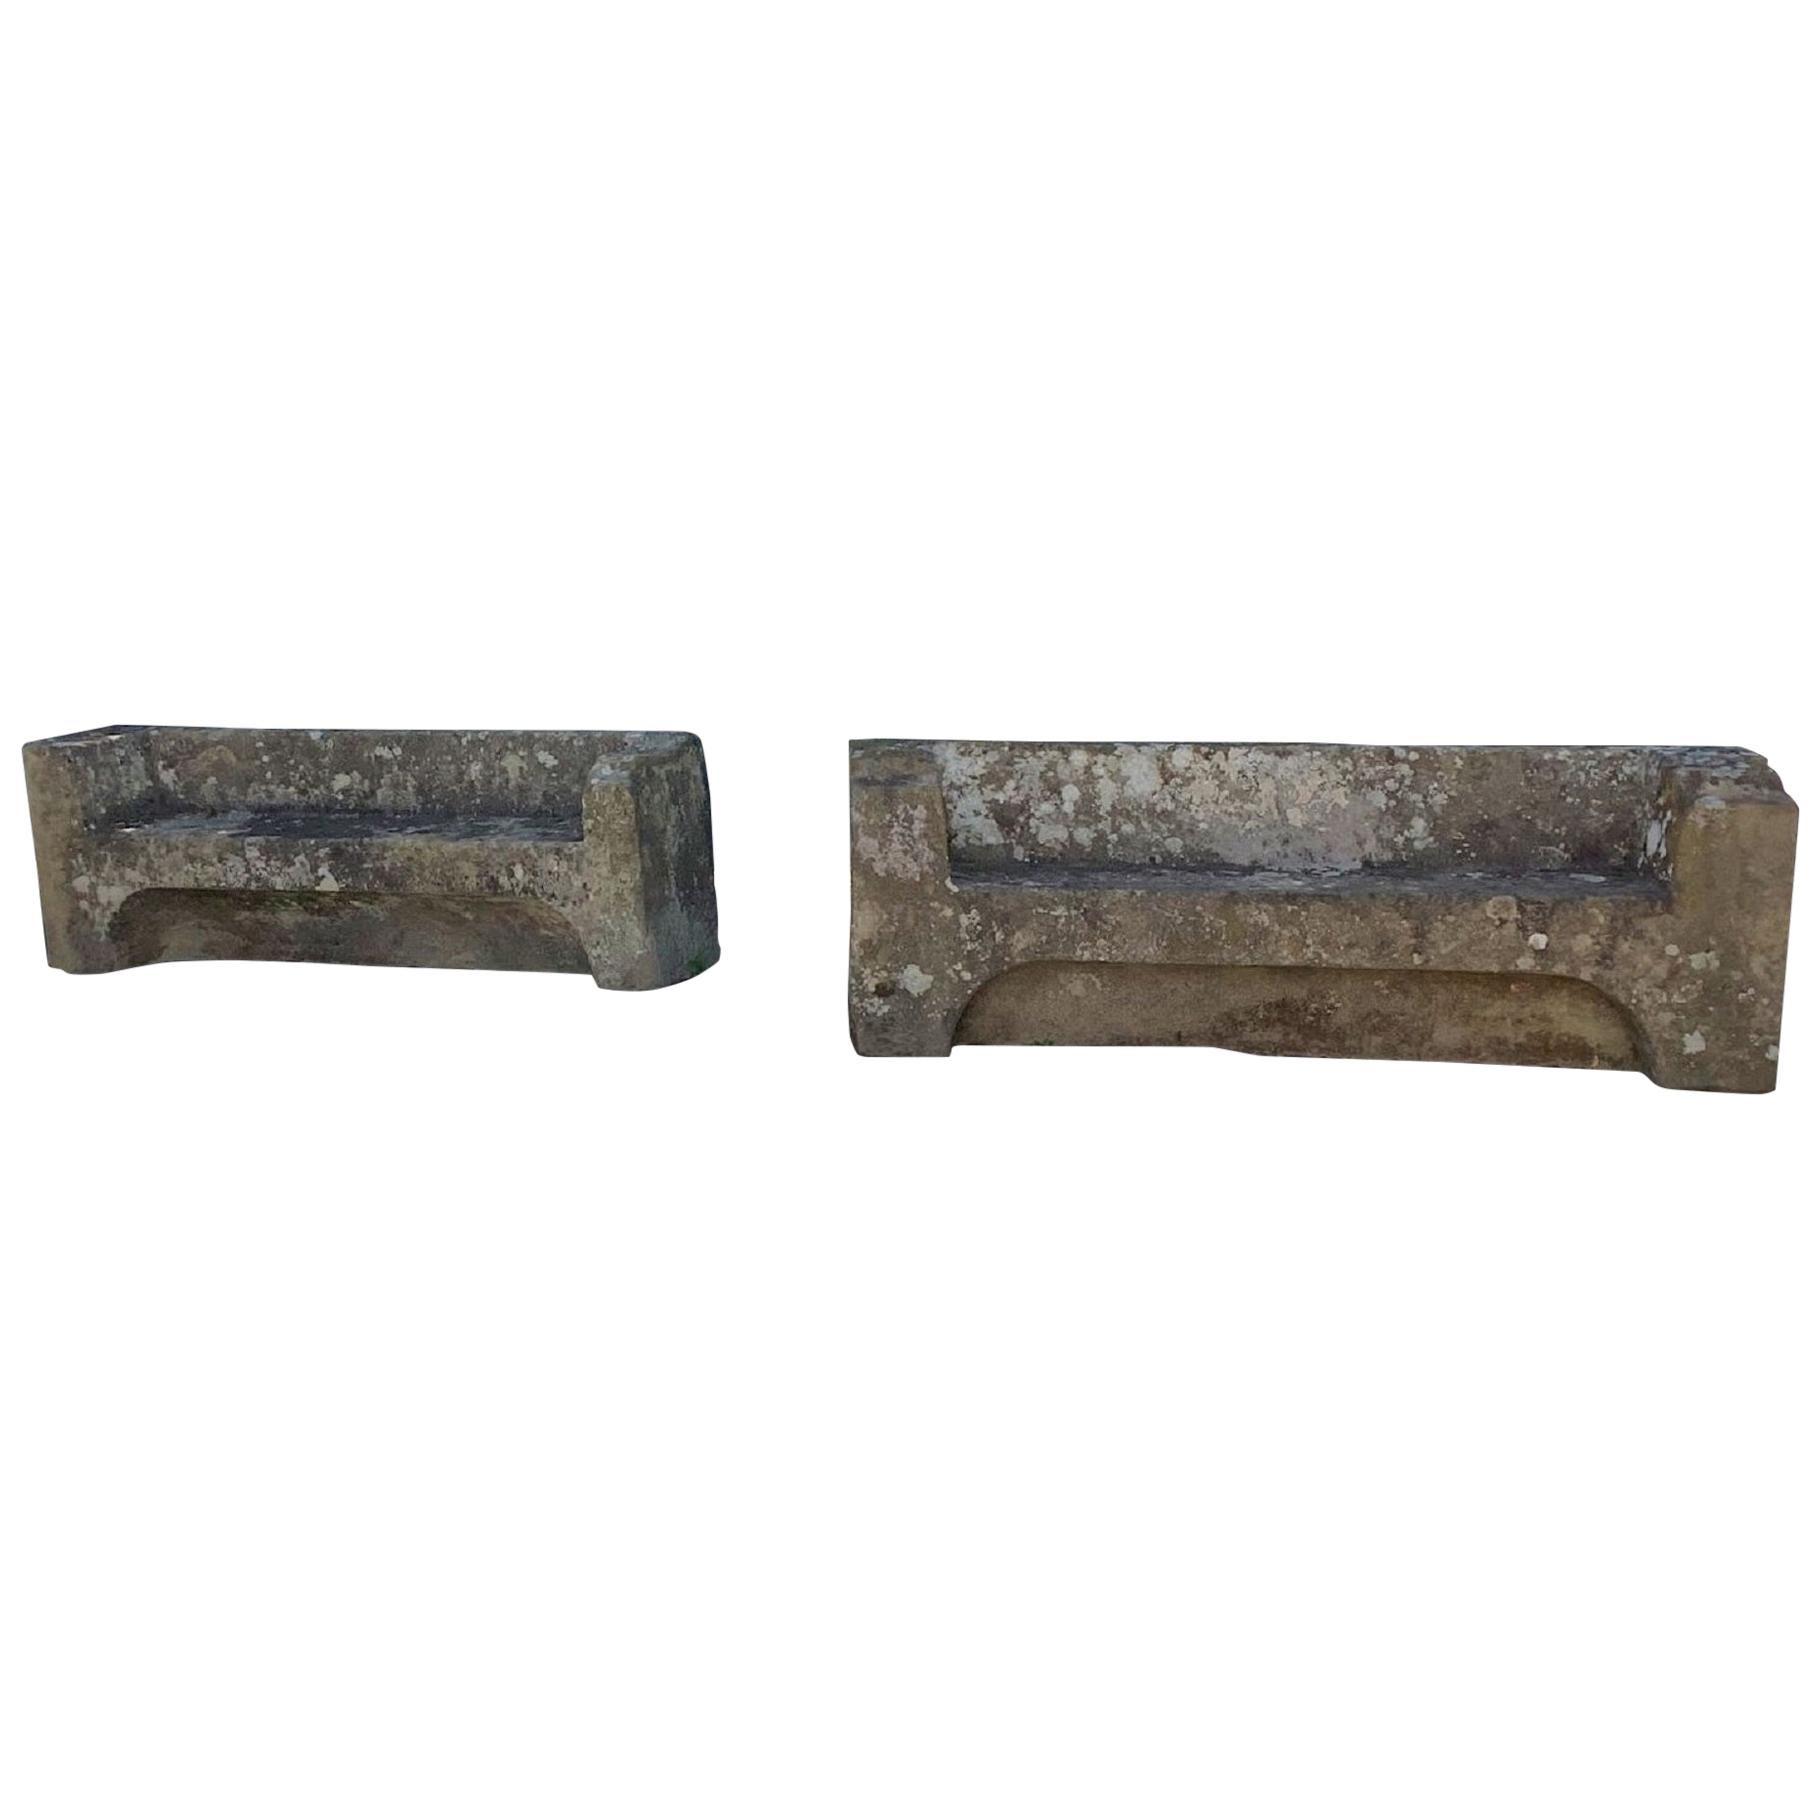 Pair of 18th Century Stone Garden Benches